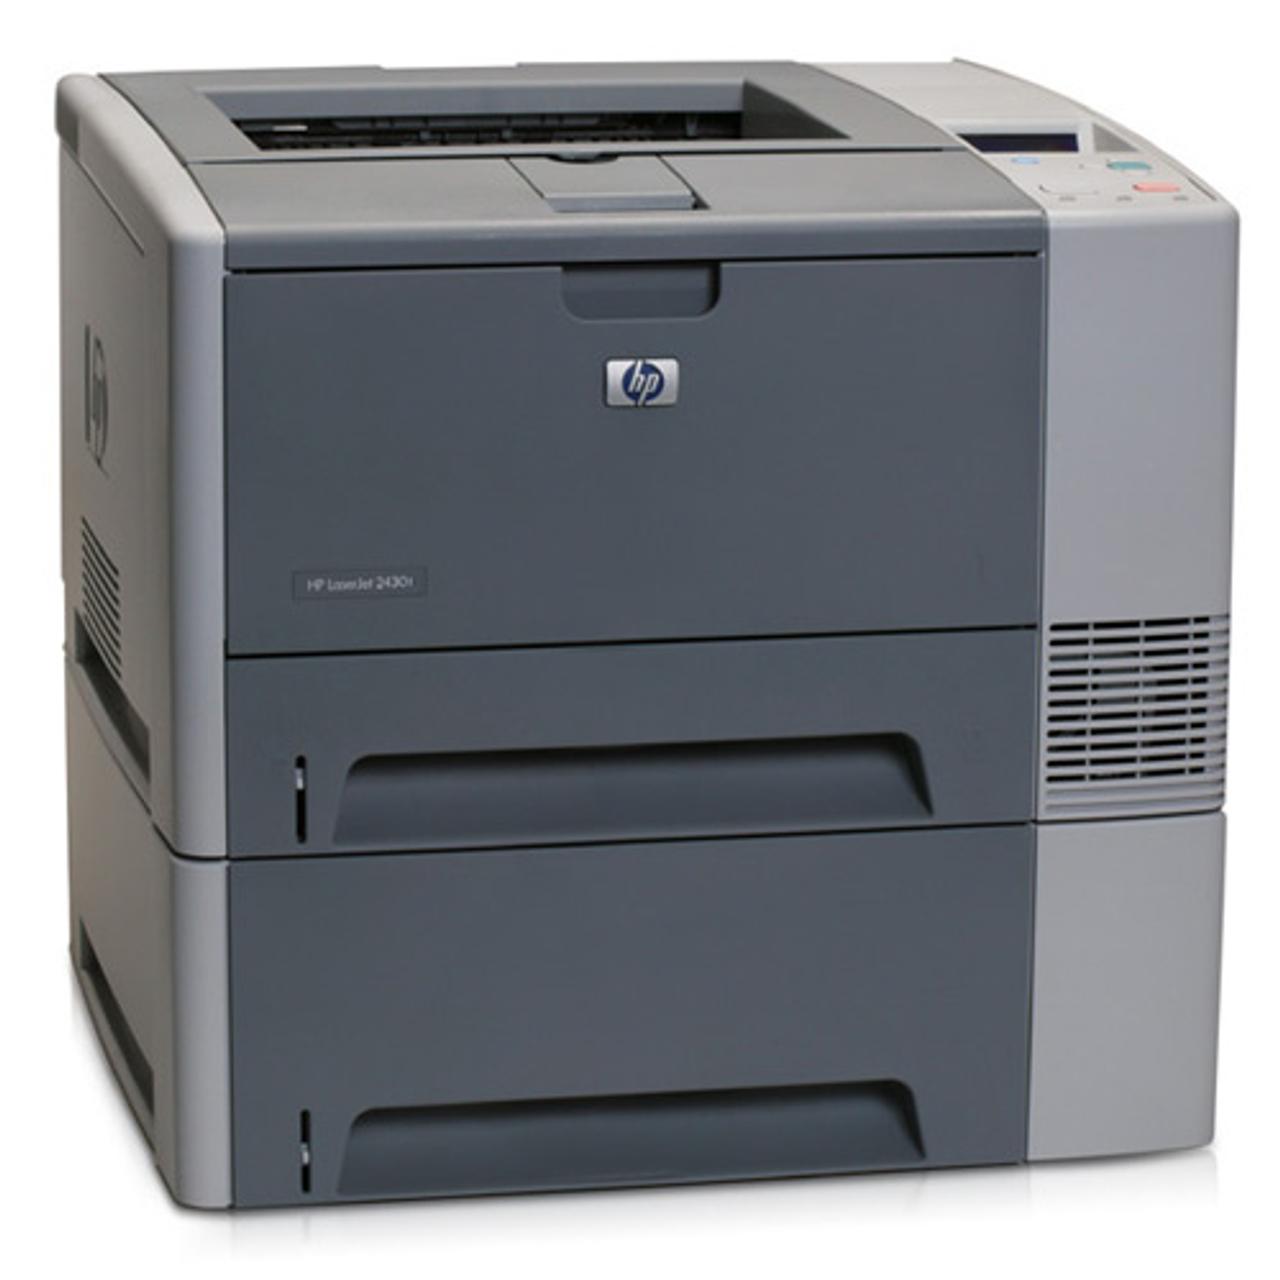 HP LaserJet 2430tn - q5961a - HP Laser Printer for sale